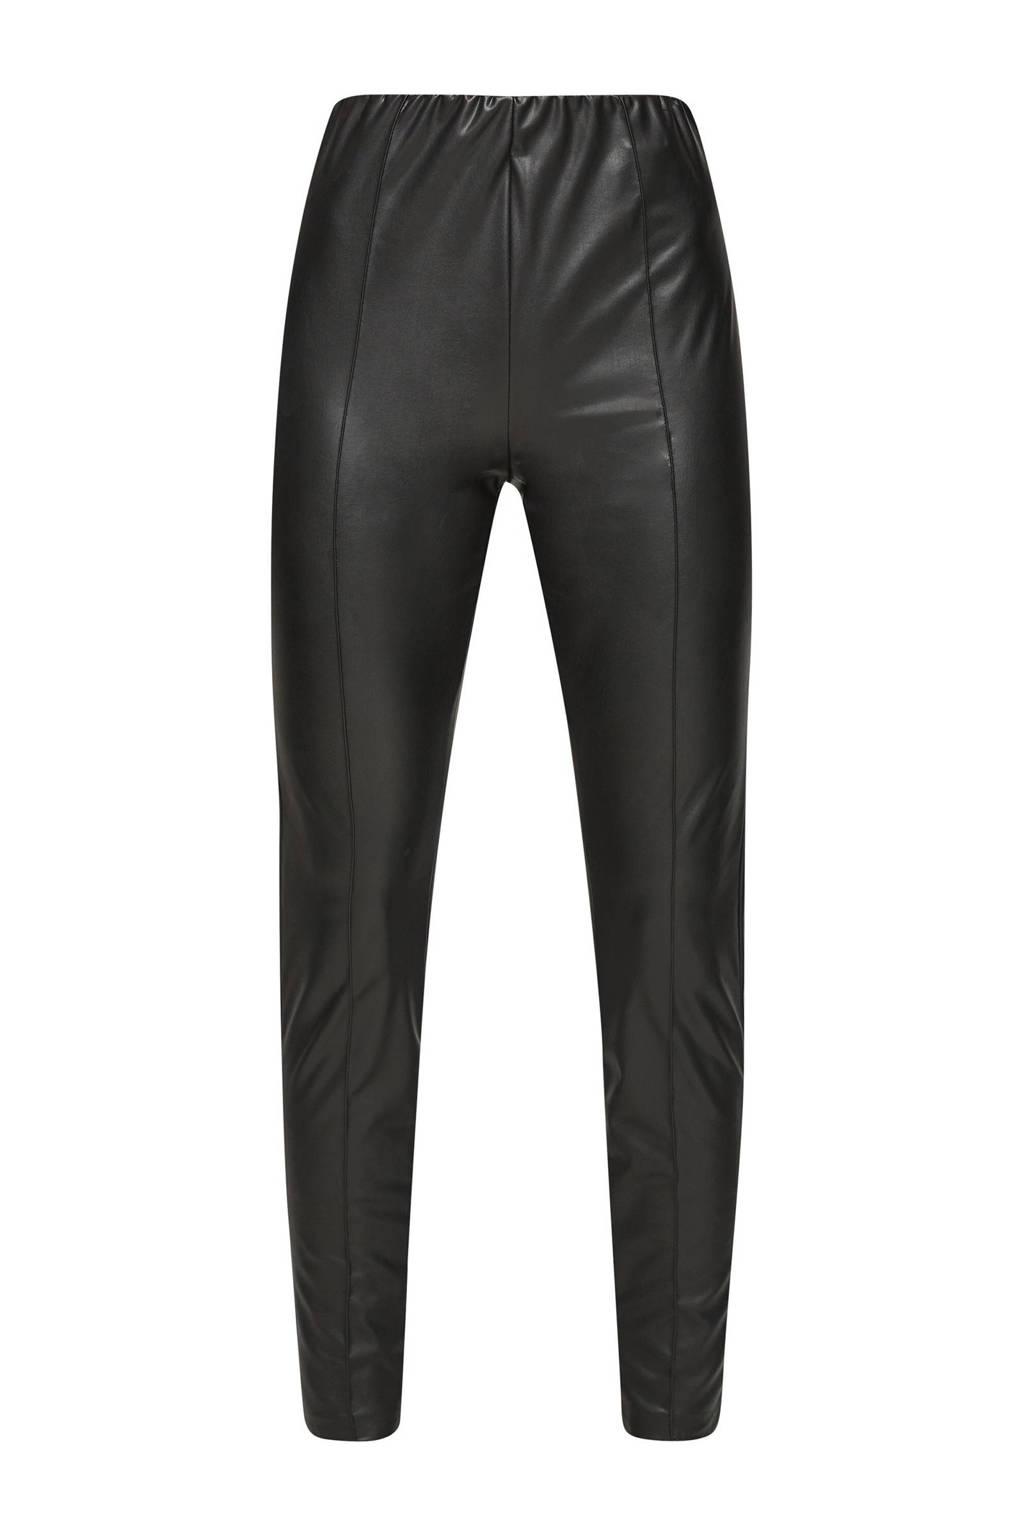 Q/S designed by imitatieleren legging zwart, Zwart